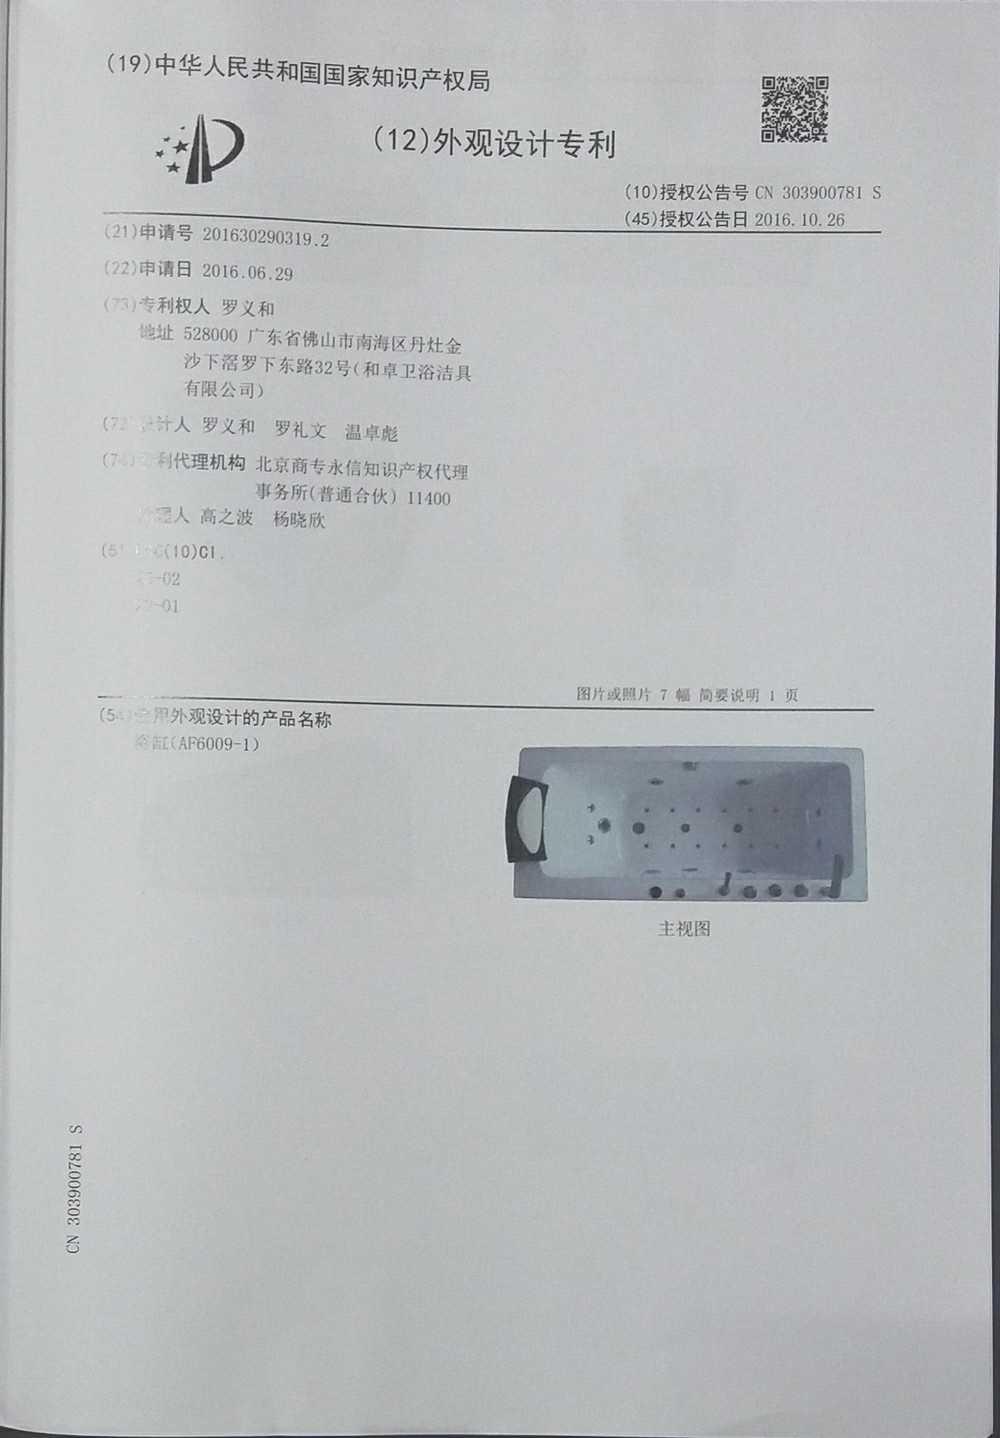 Patent 1 for sector massage bathtub